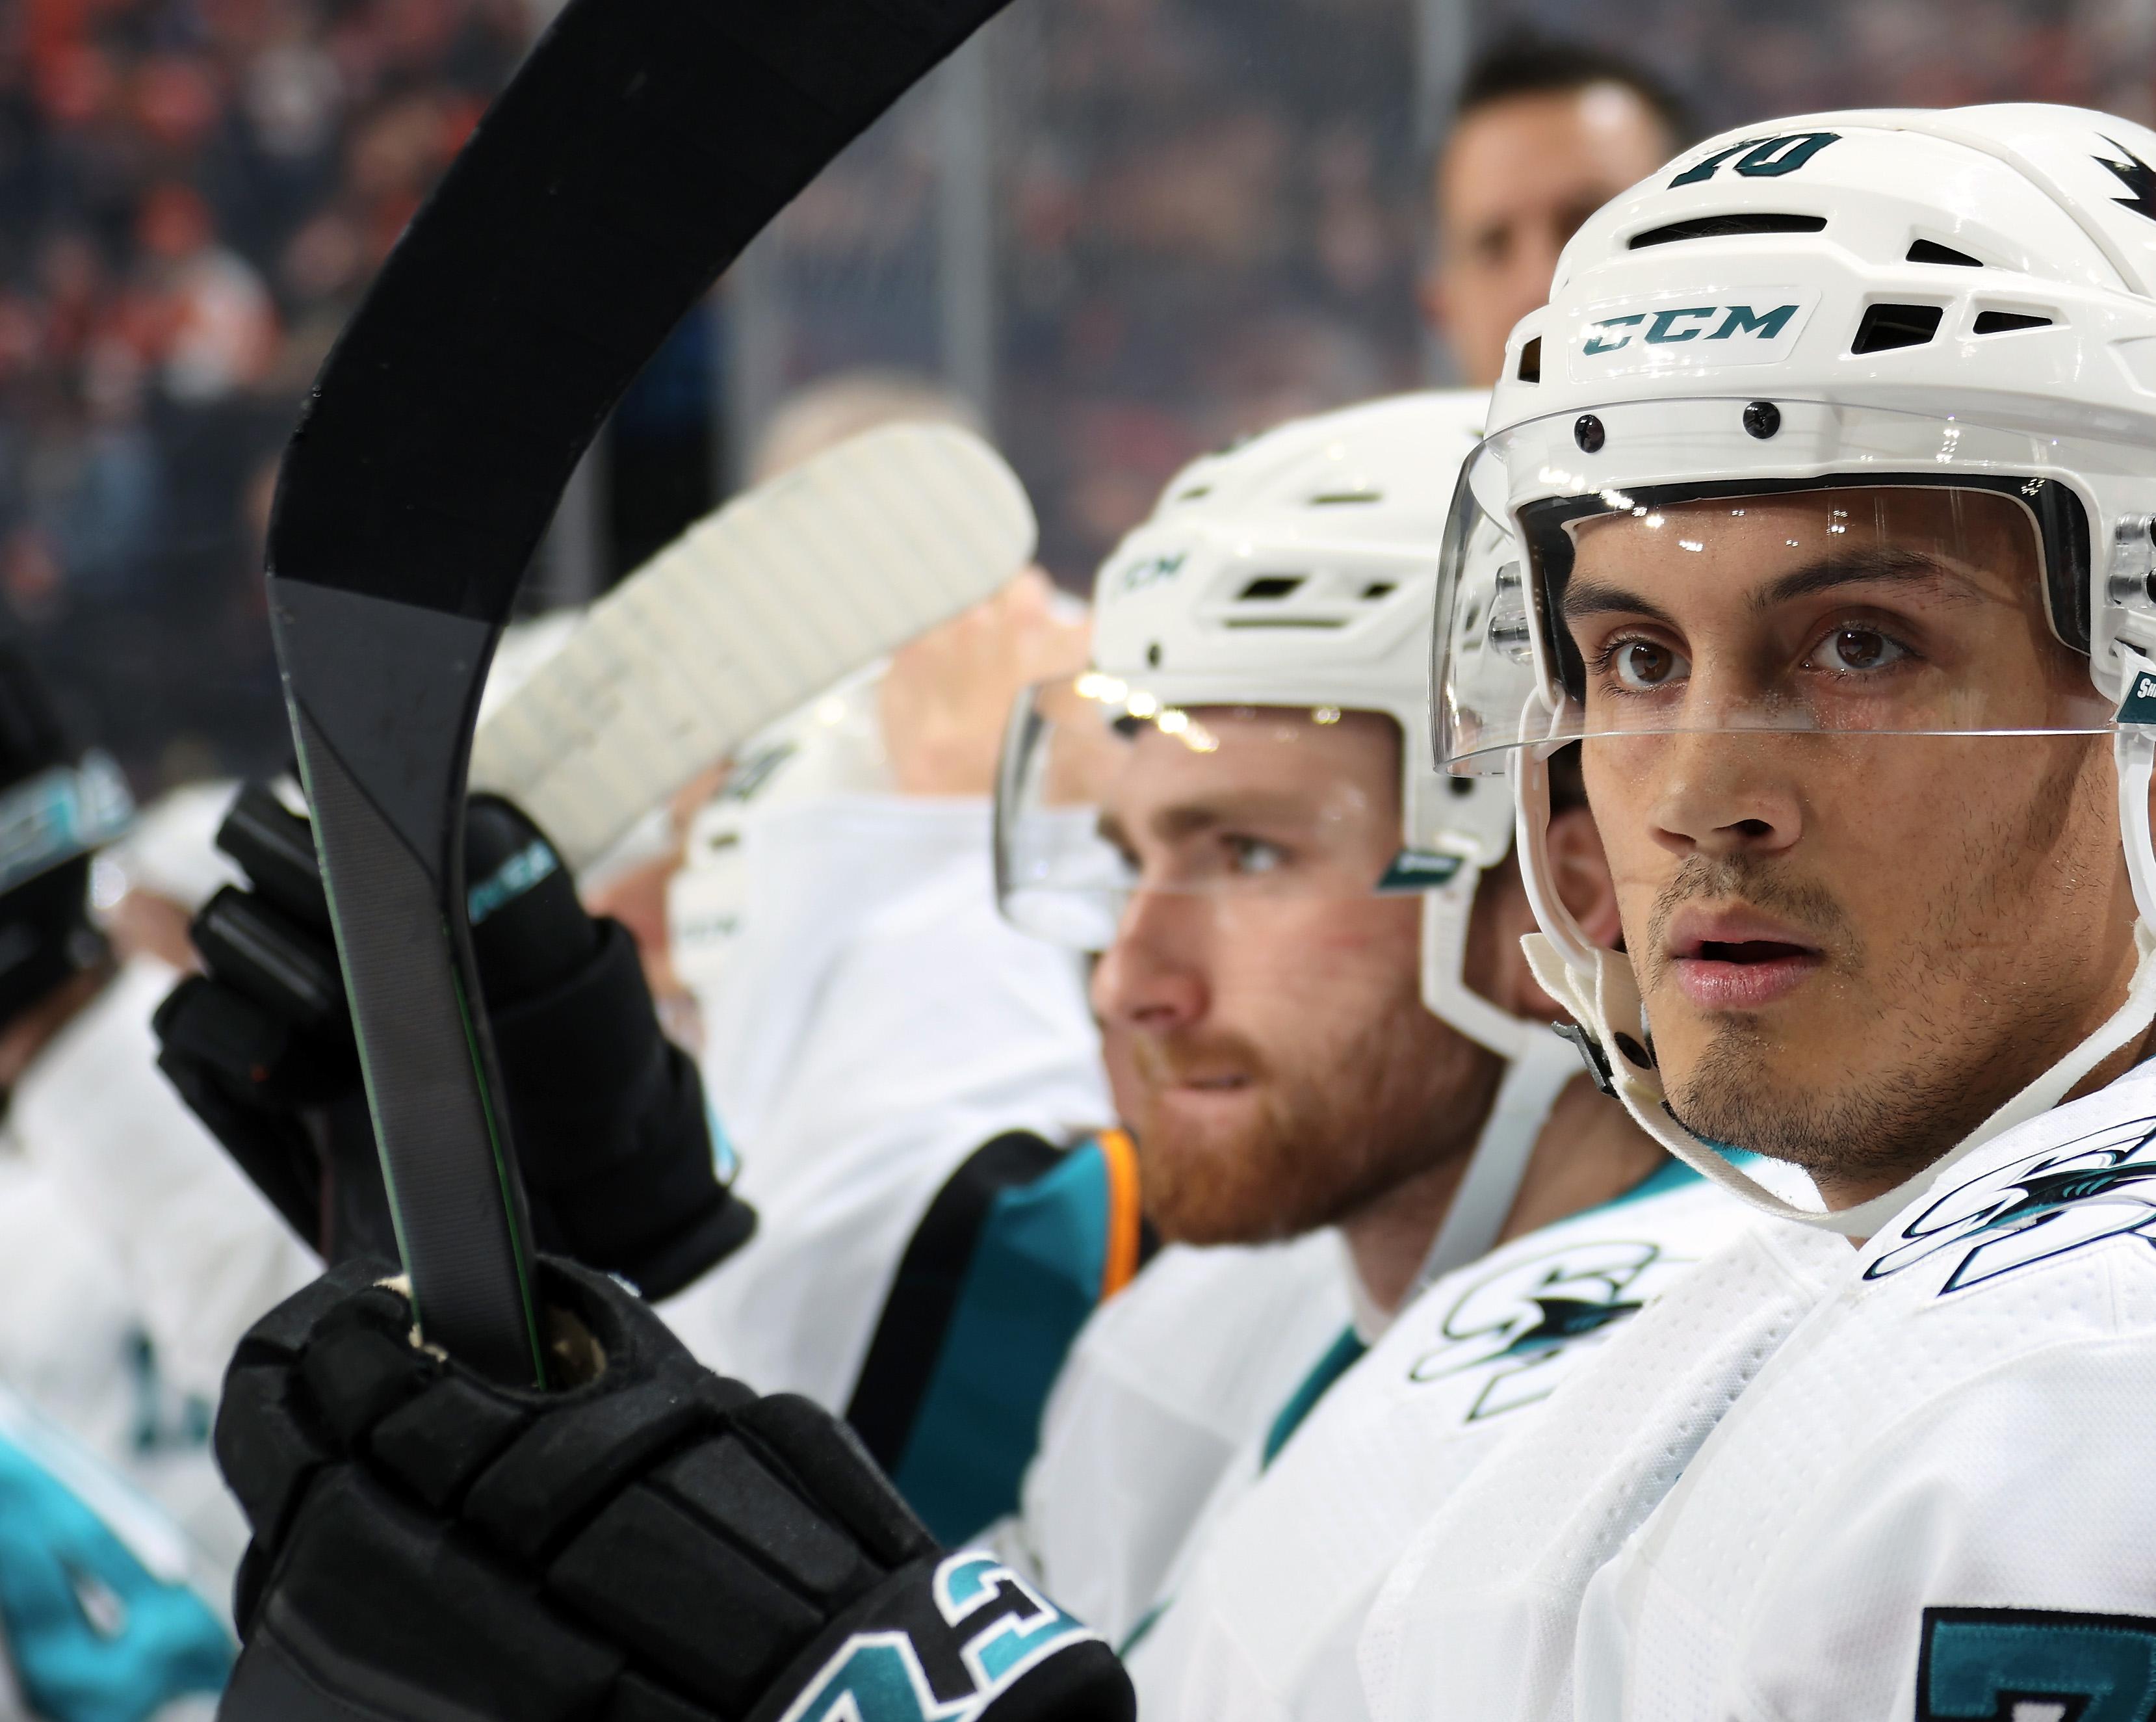 Alexander True #70 of the San Jose Sharks looks on from the bench against the Philadelphia Flyers on February 25, 2020 at the Wells Fargo Center in Philadelphia, Pennsylvania.